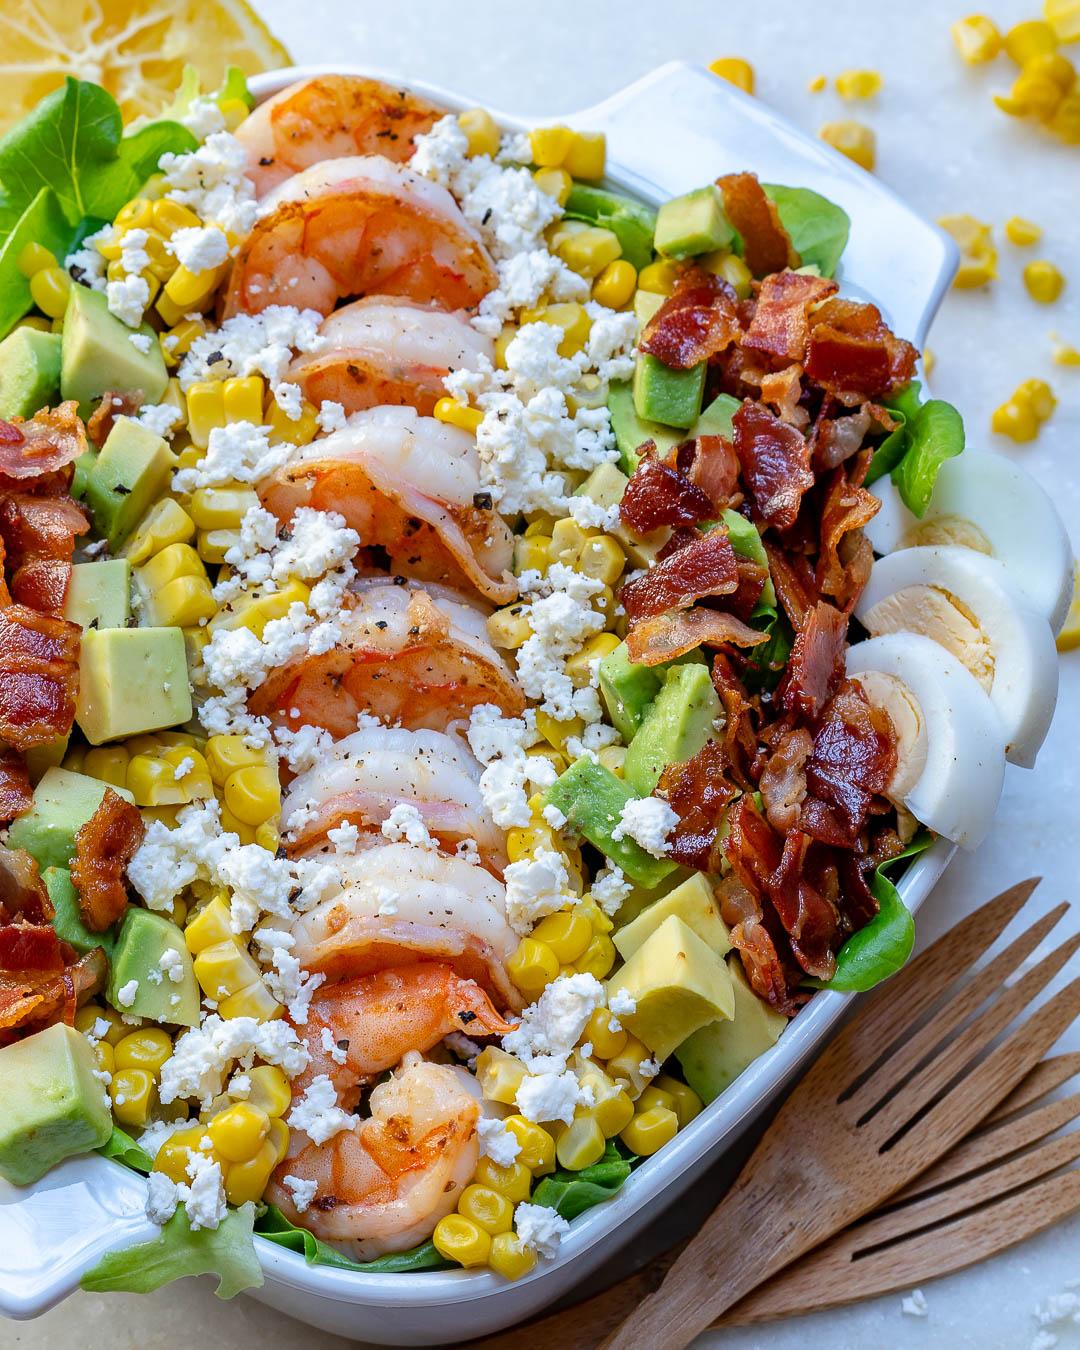 Ultimate Shrimp Cobb Salad Ingredients